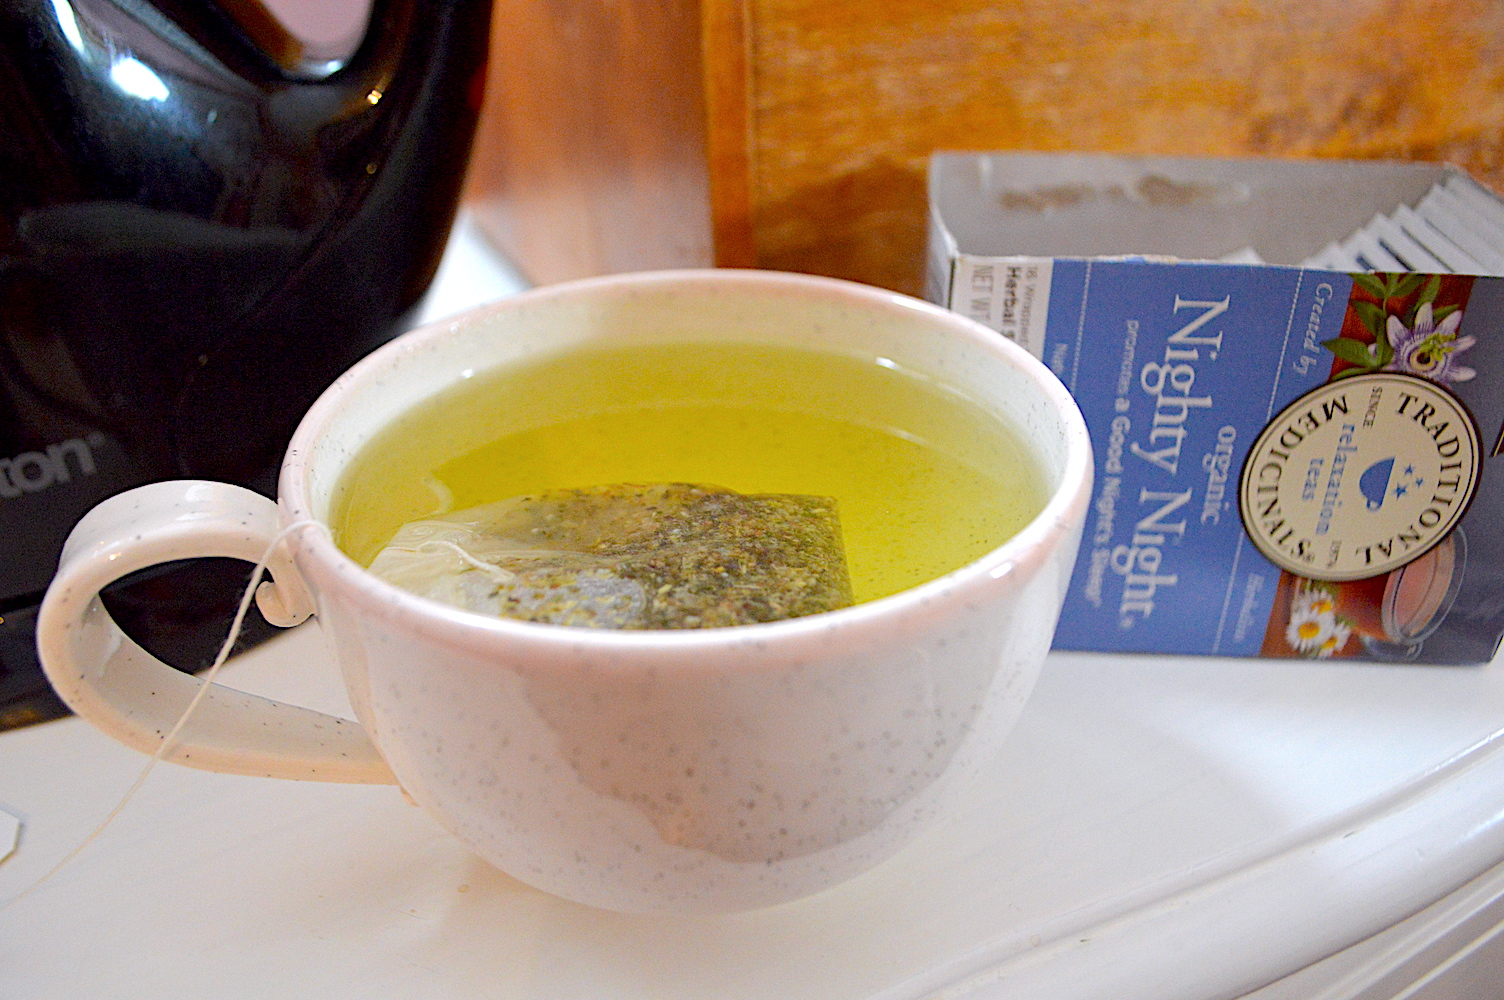 Traditional Medicinals Relaxation Tea Organic Nighty Night